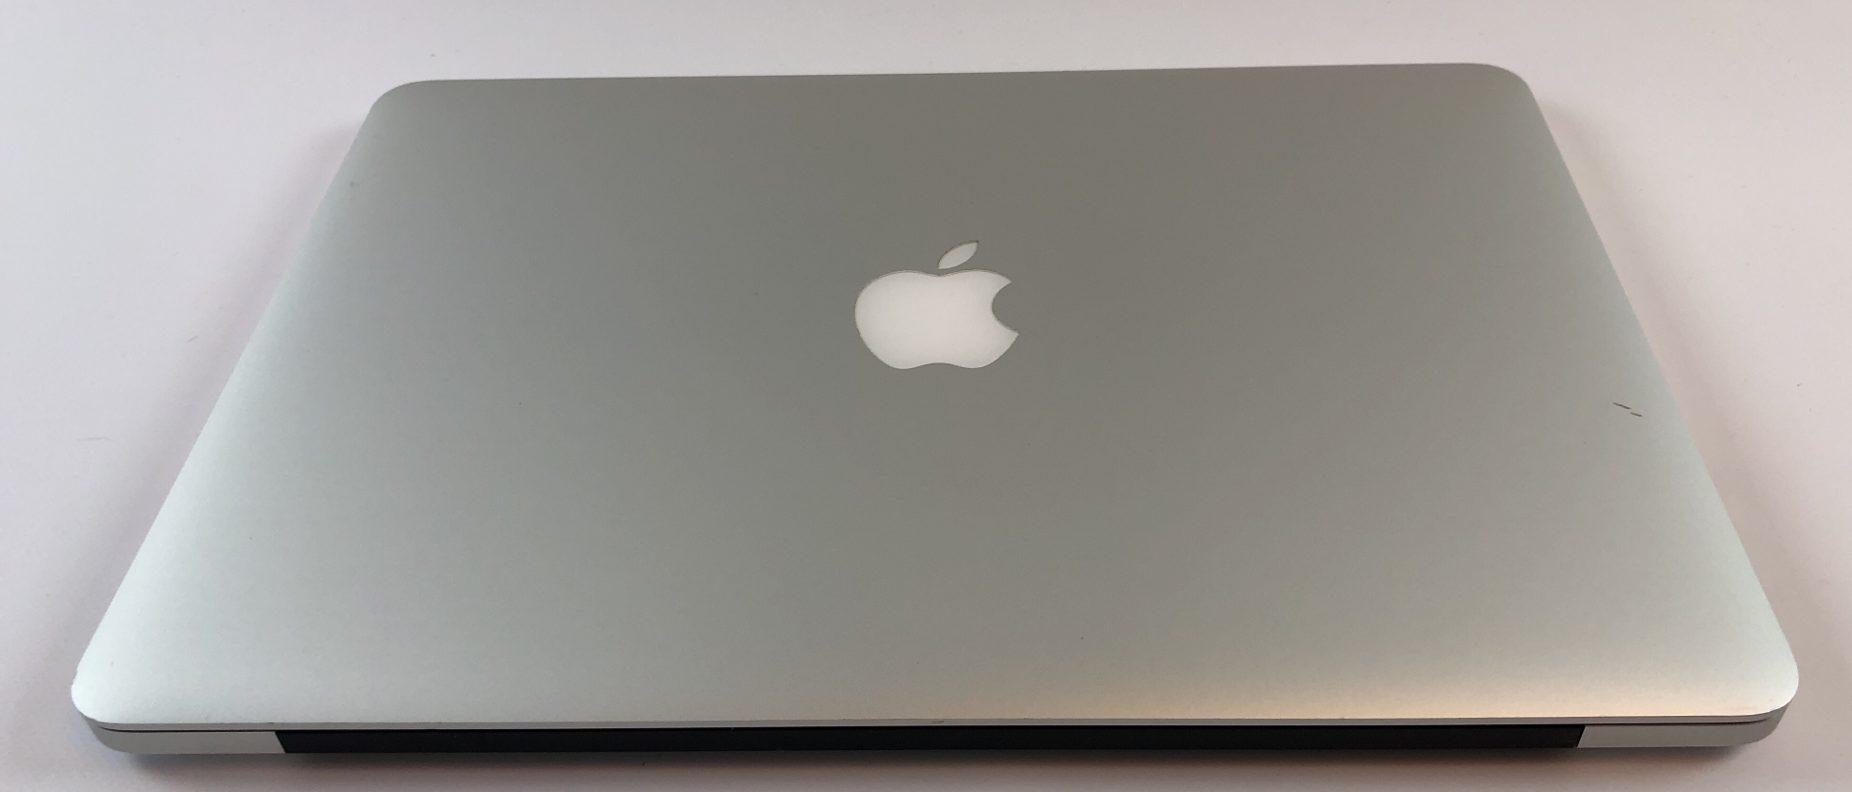 "MacBook Pro Retina 13"" Early 2015 (Intel Core i7 3.1 GHz 16 GB RAM 512 GB SSD), Intel Core i7 3.1 GHz, 16 GB RAM, 512 GB SSD, bild 2"